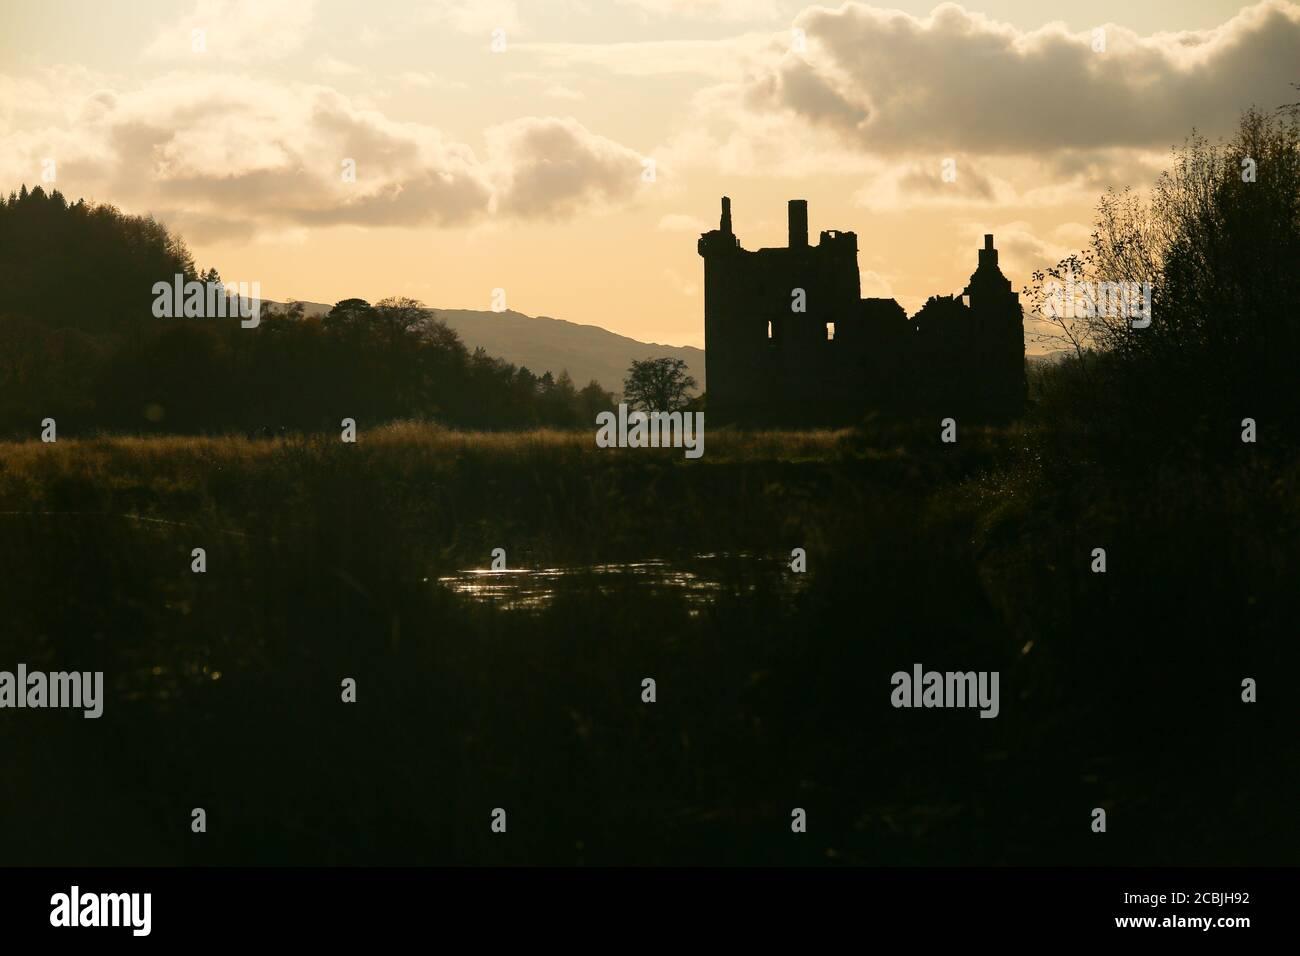 Kilchurn Castle in silhouette, Scotland Stock Photo